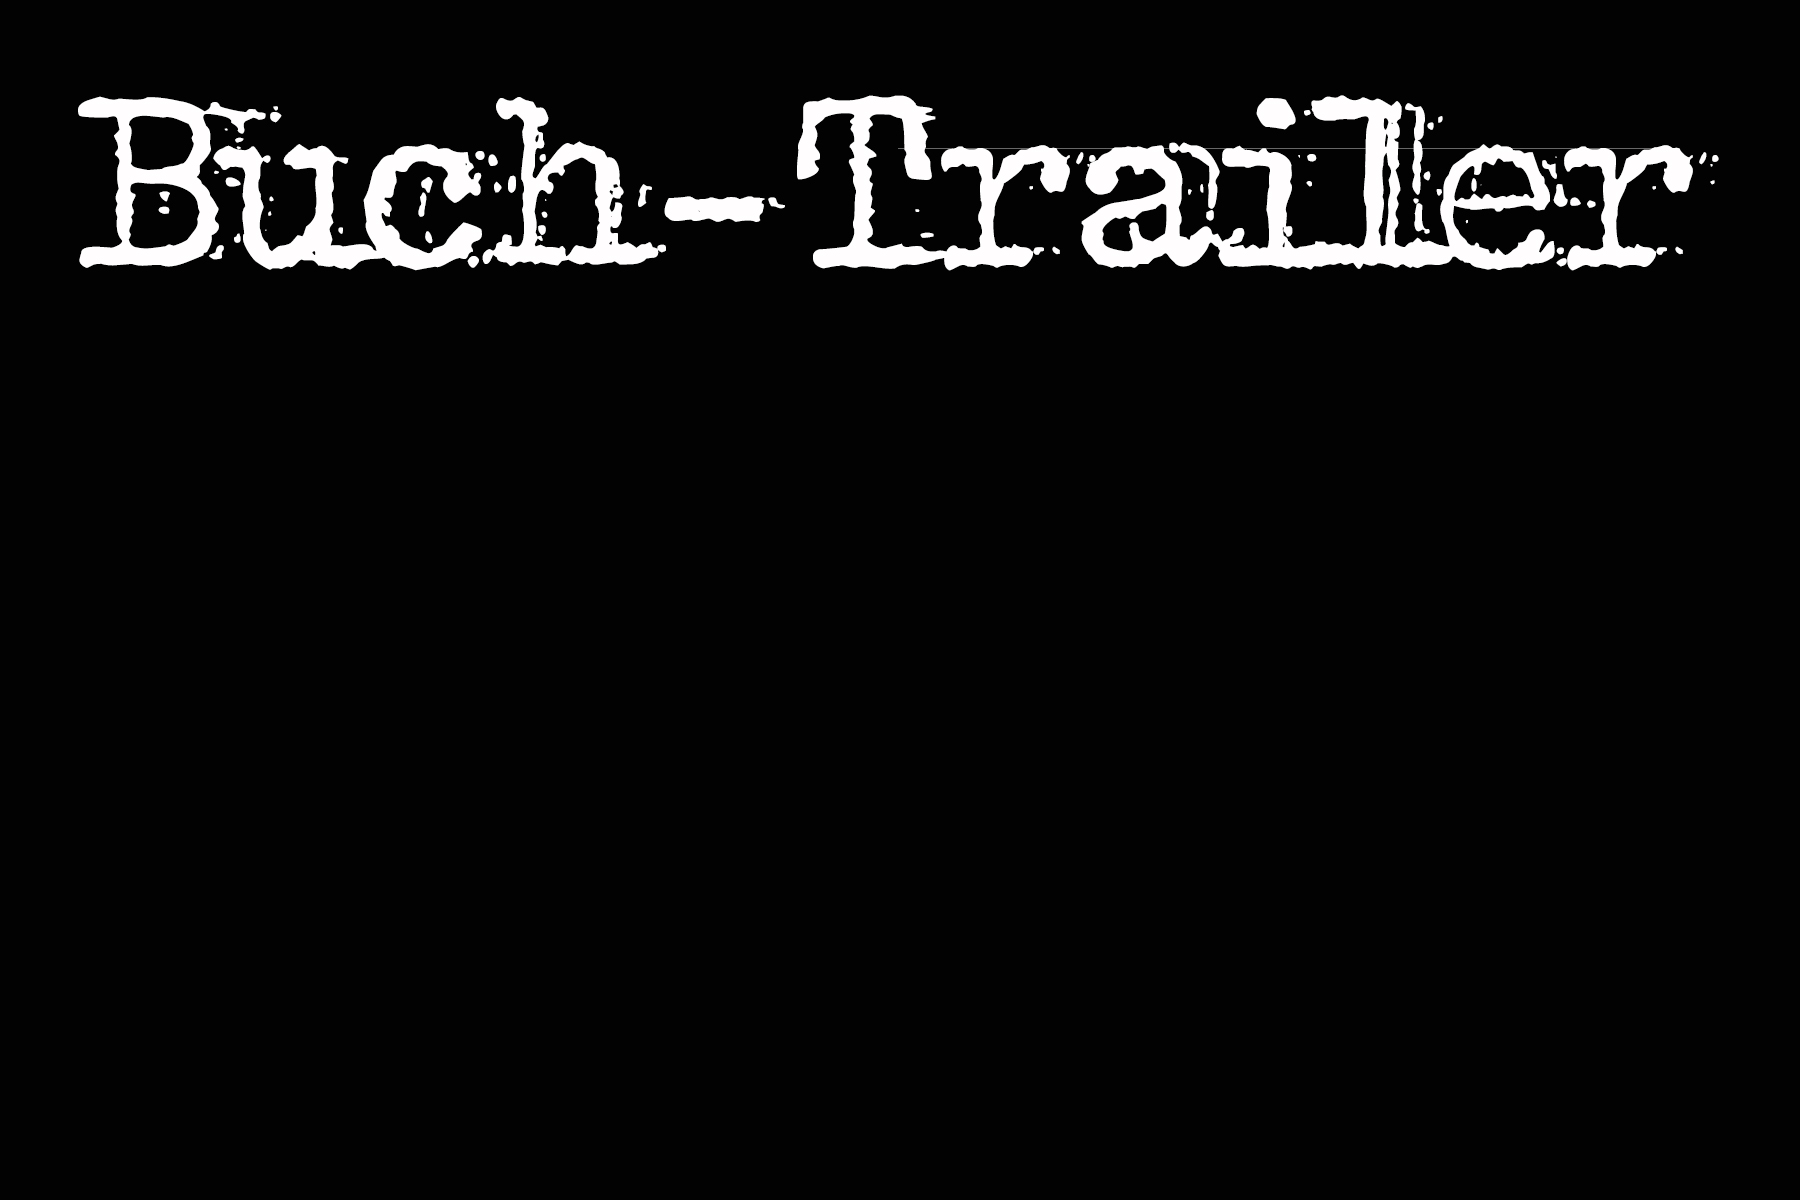 Andrea_Reinhardt_Buch_Trailer